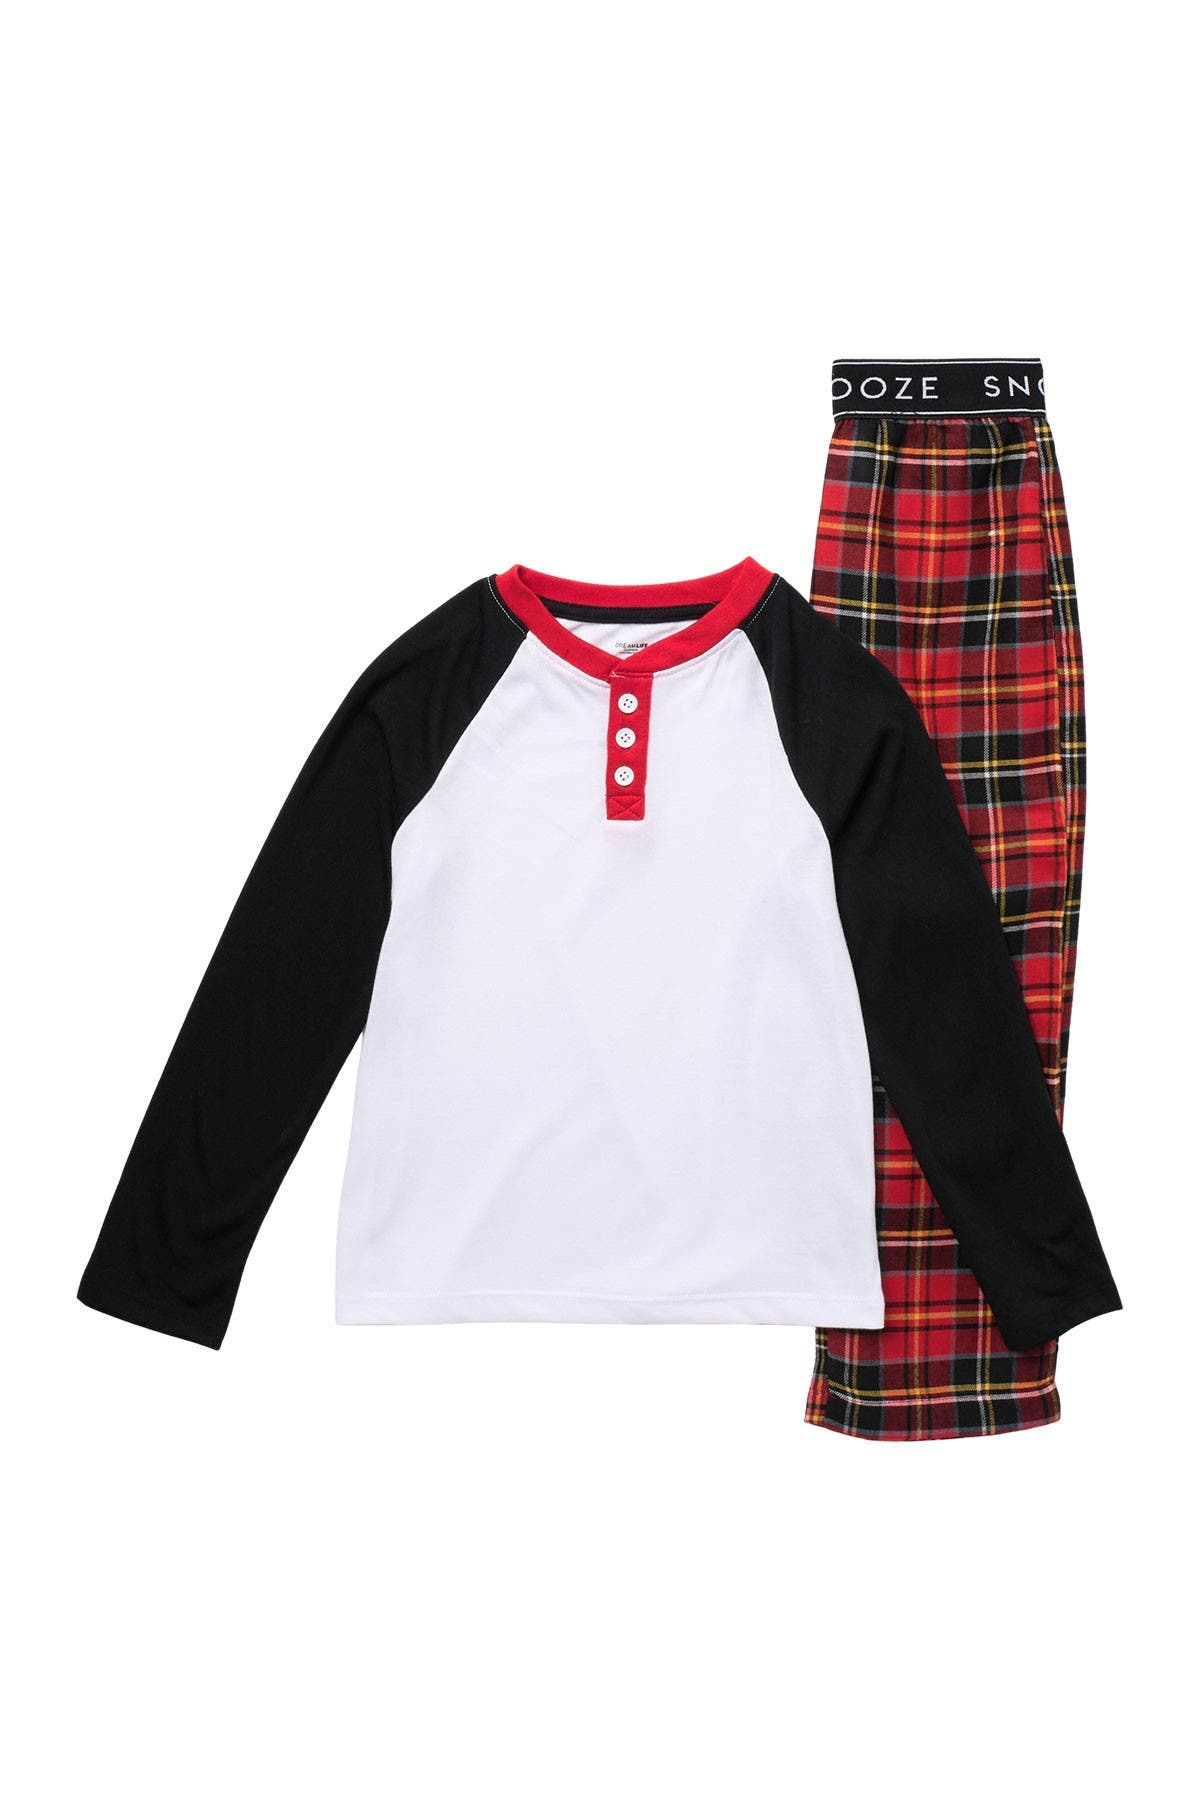 Image of Dream Life Flannel Top & Pajama Pants